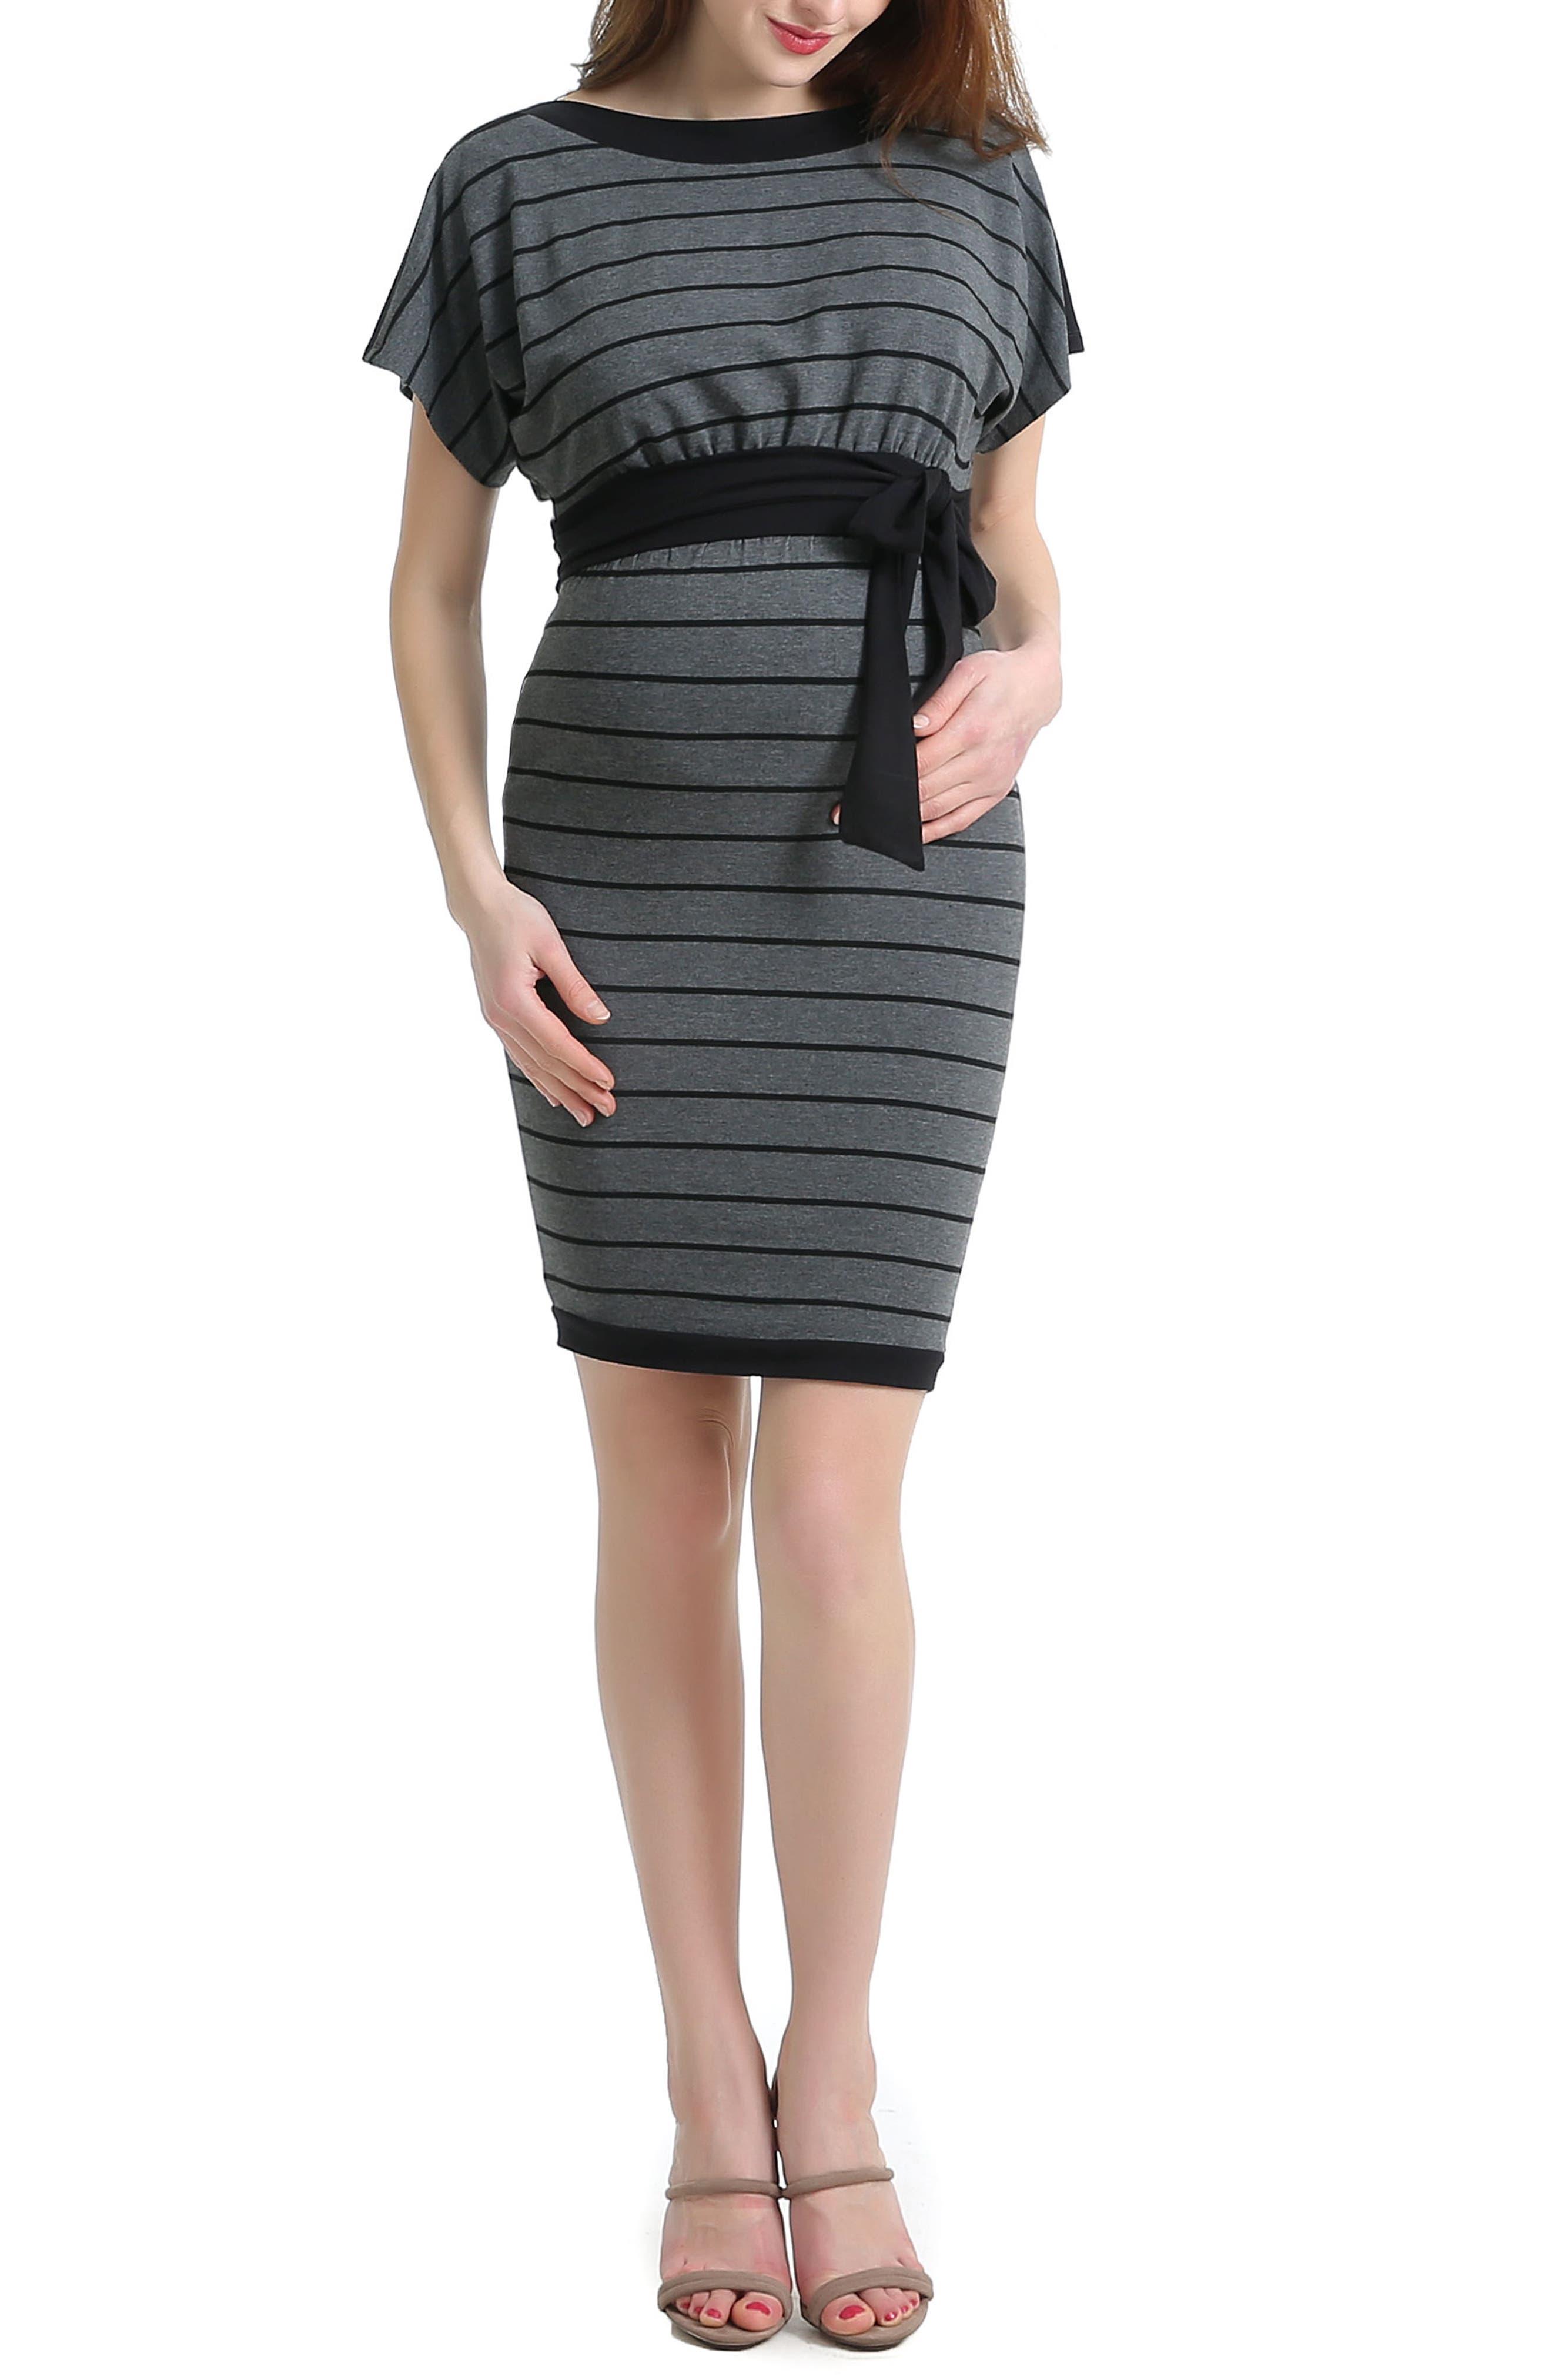 Anna Stretch Maternity Dress,                         Main,                         color, Black/ Gray